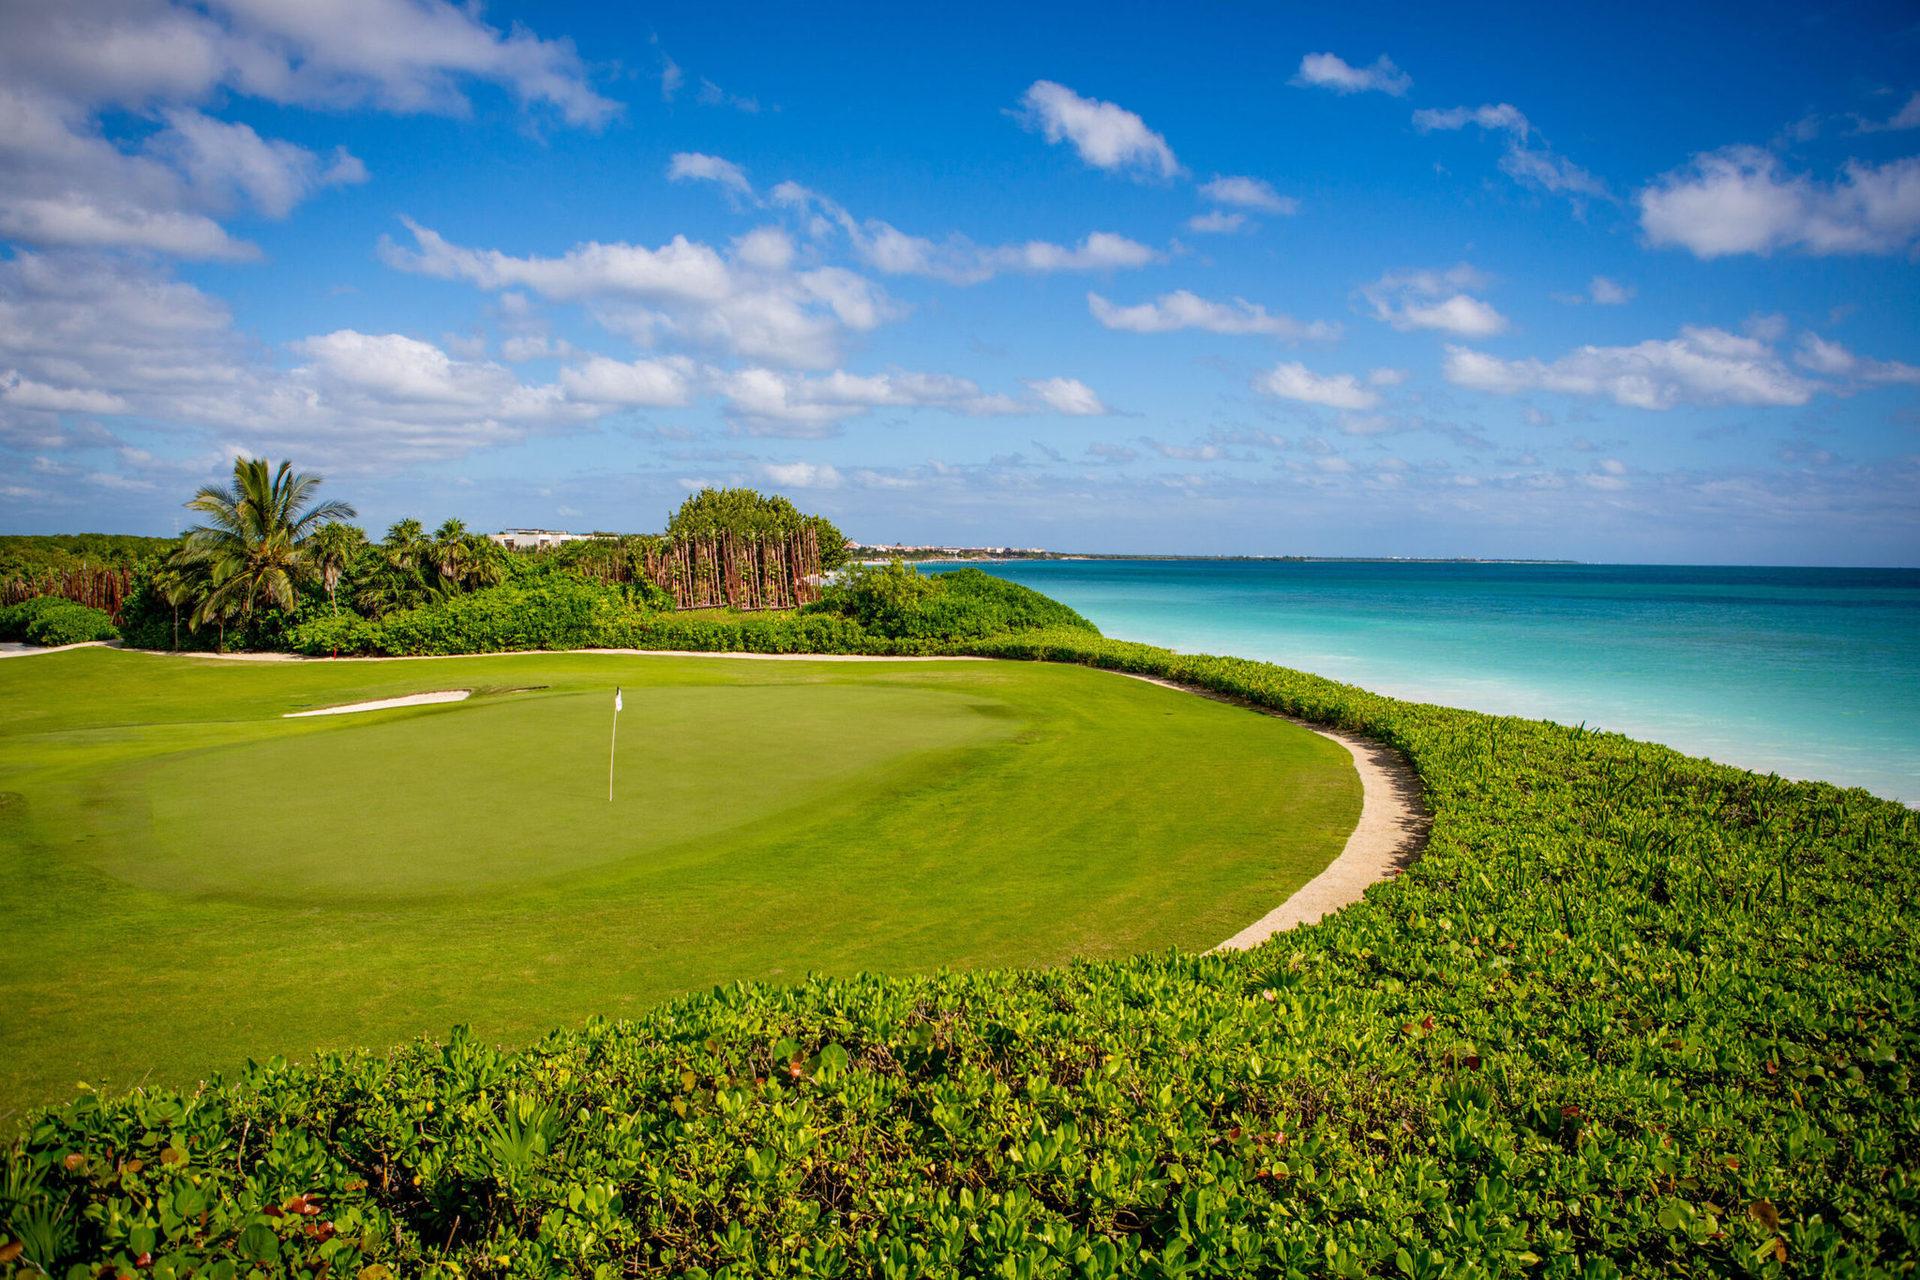 Гості готелю мають привілейований доступ до гольф-клубу El Camaleón.